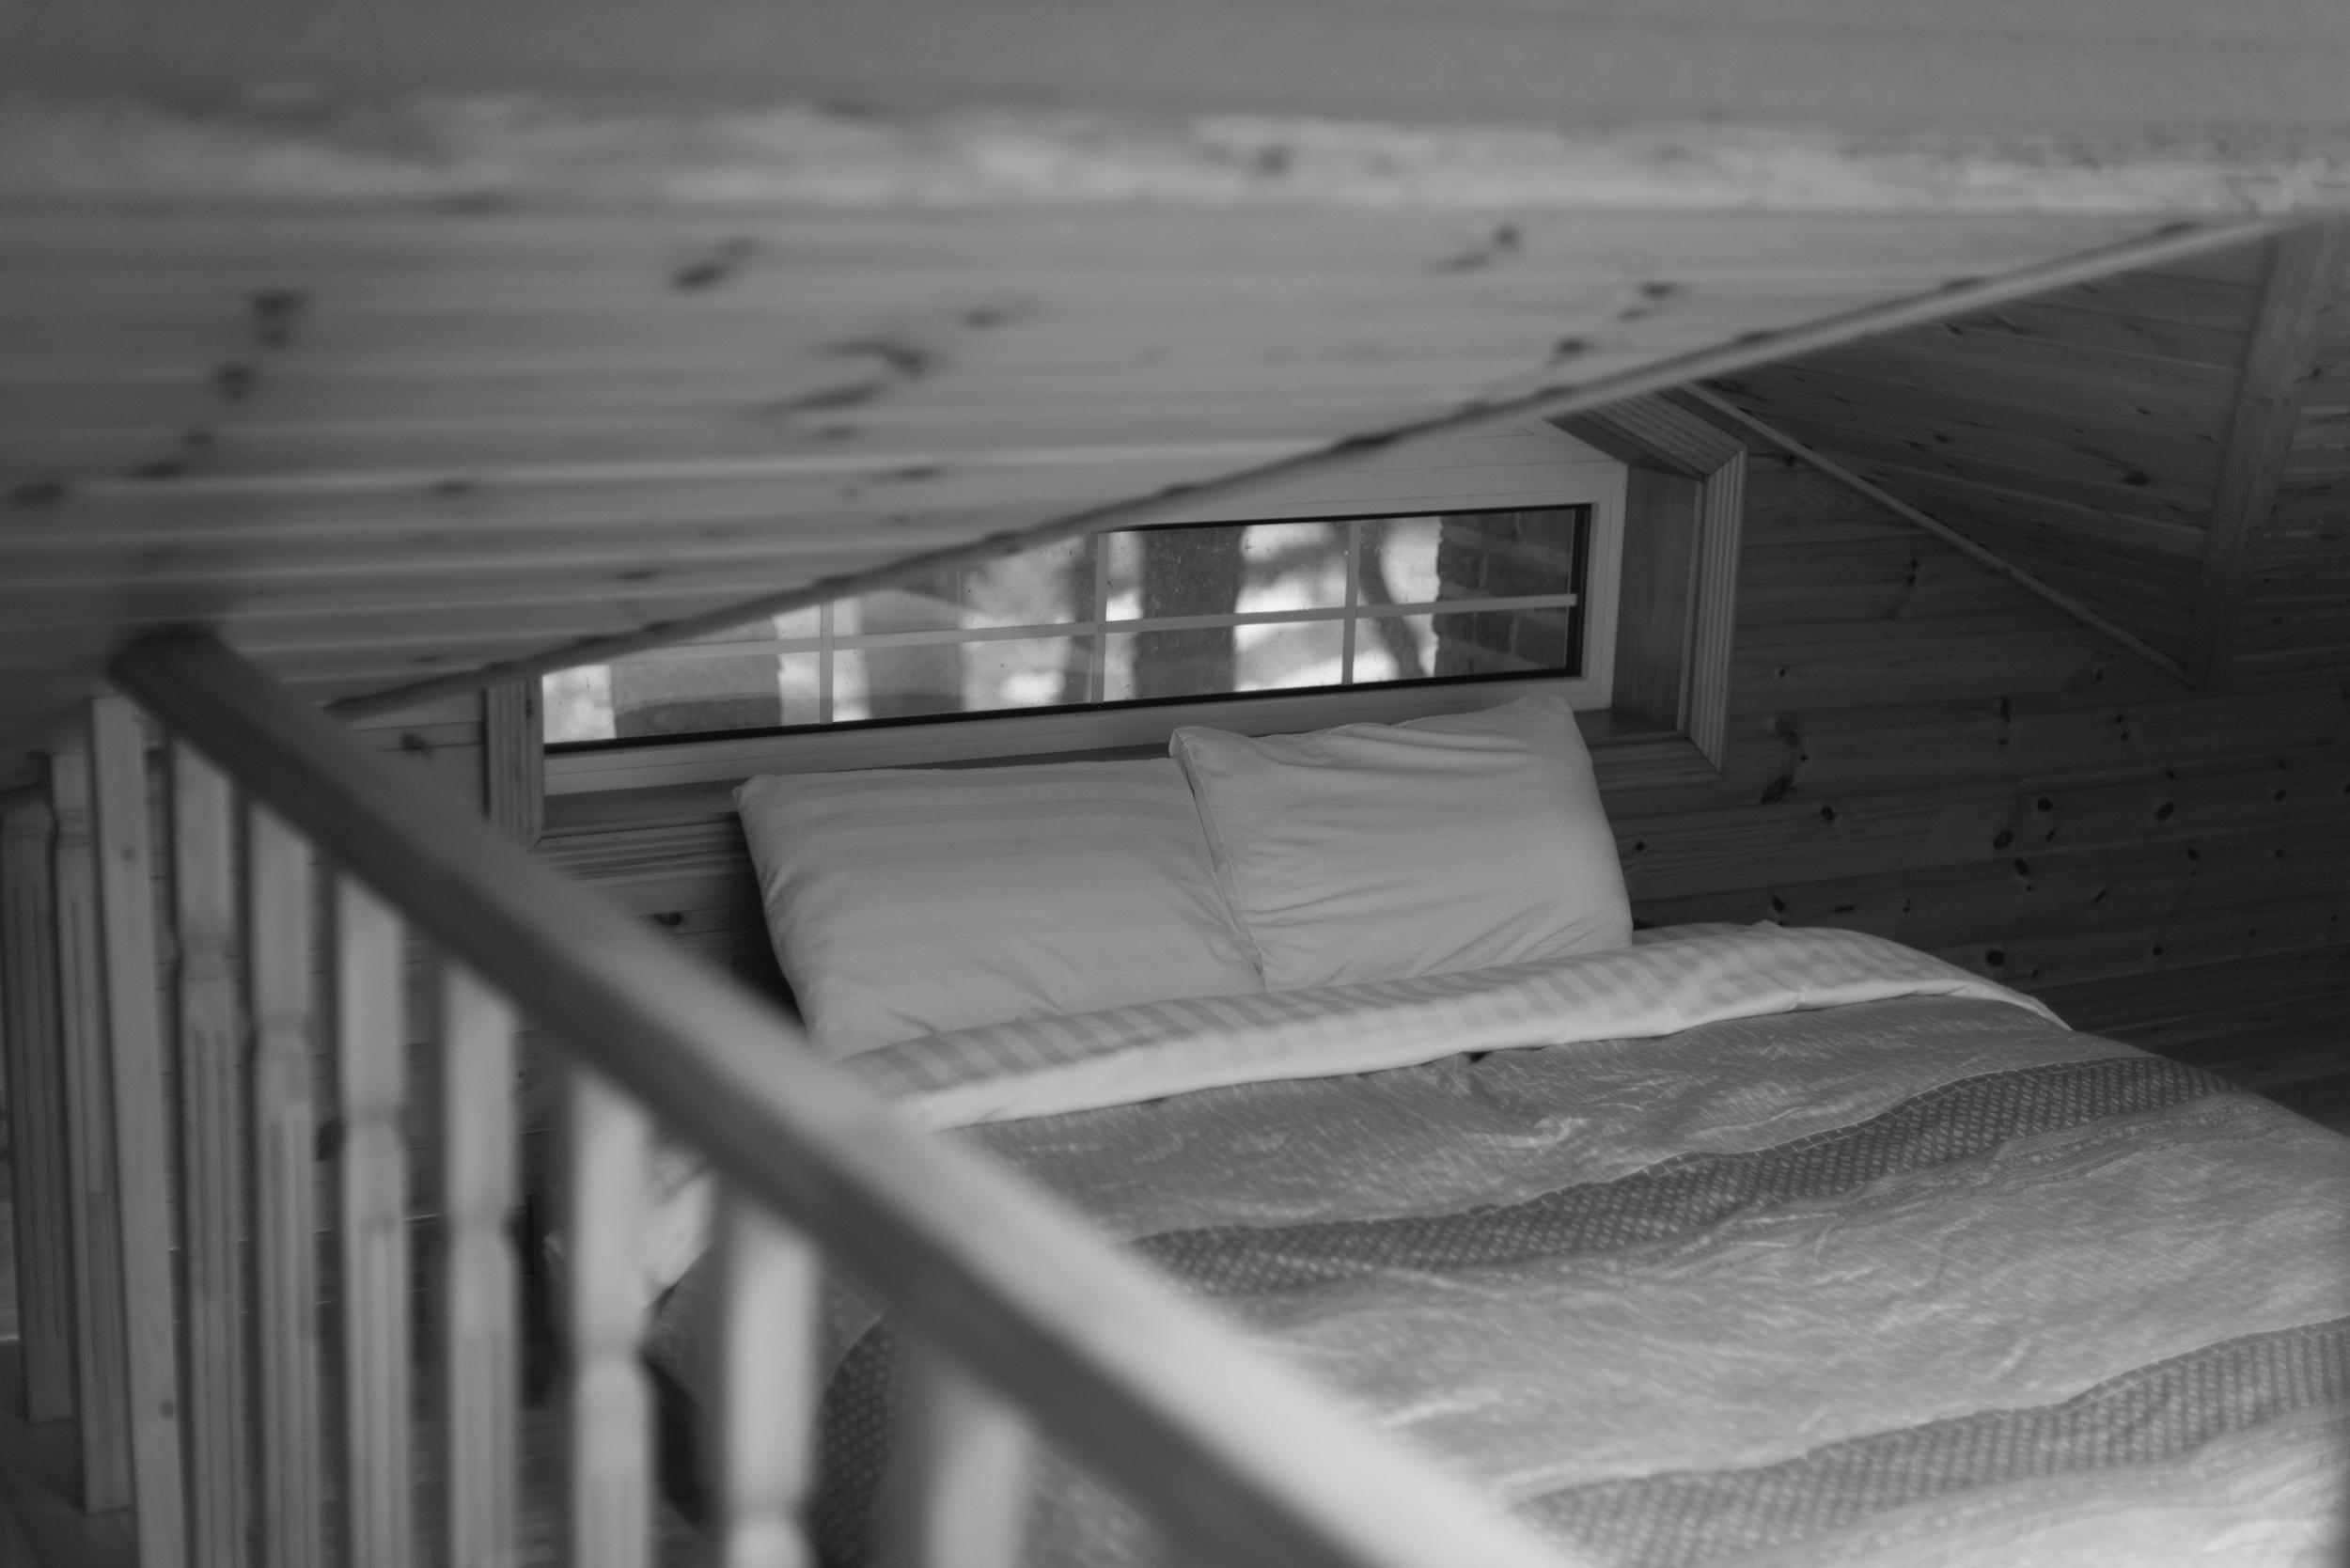 ArtInIslandPyeongChangDogFriendly Wooden Cabin Korea (24 of 258).JPG